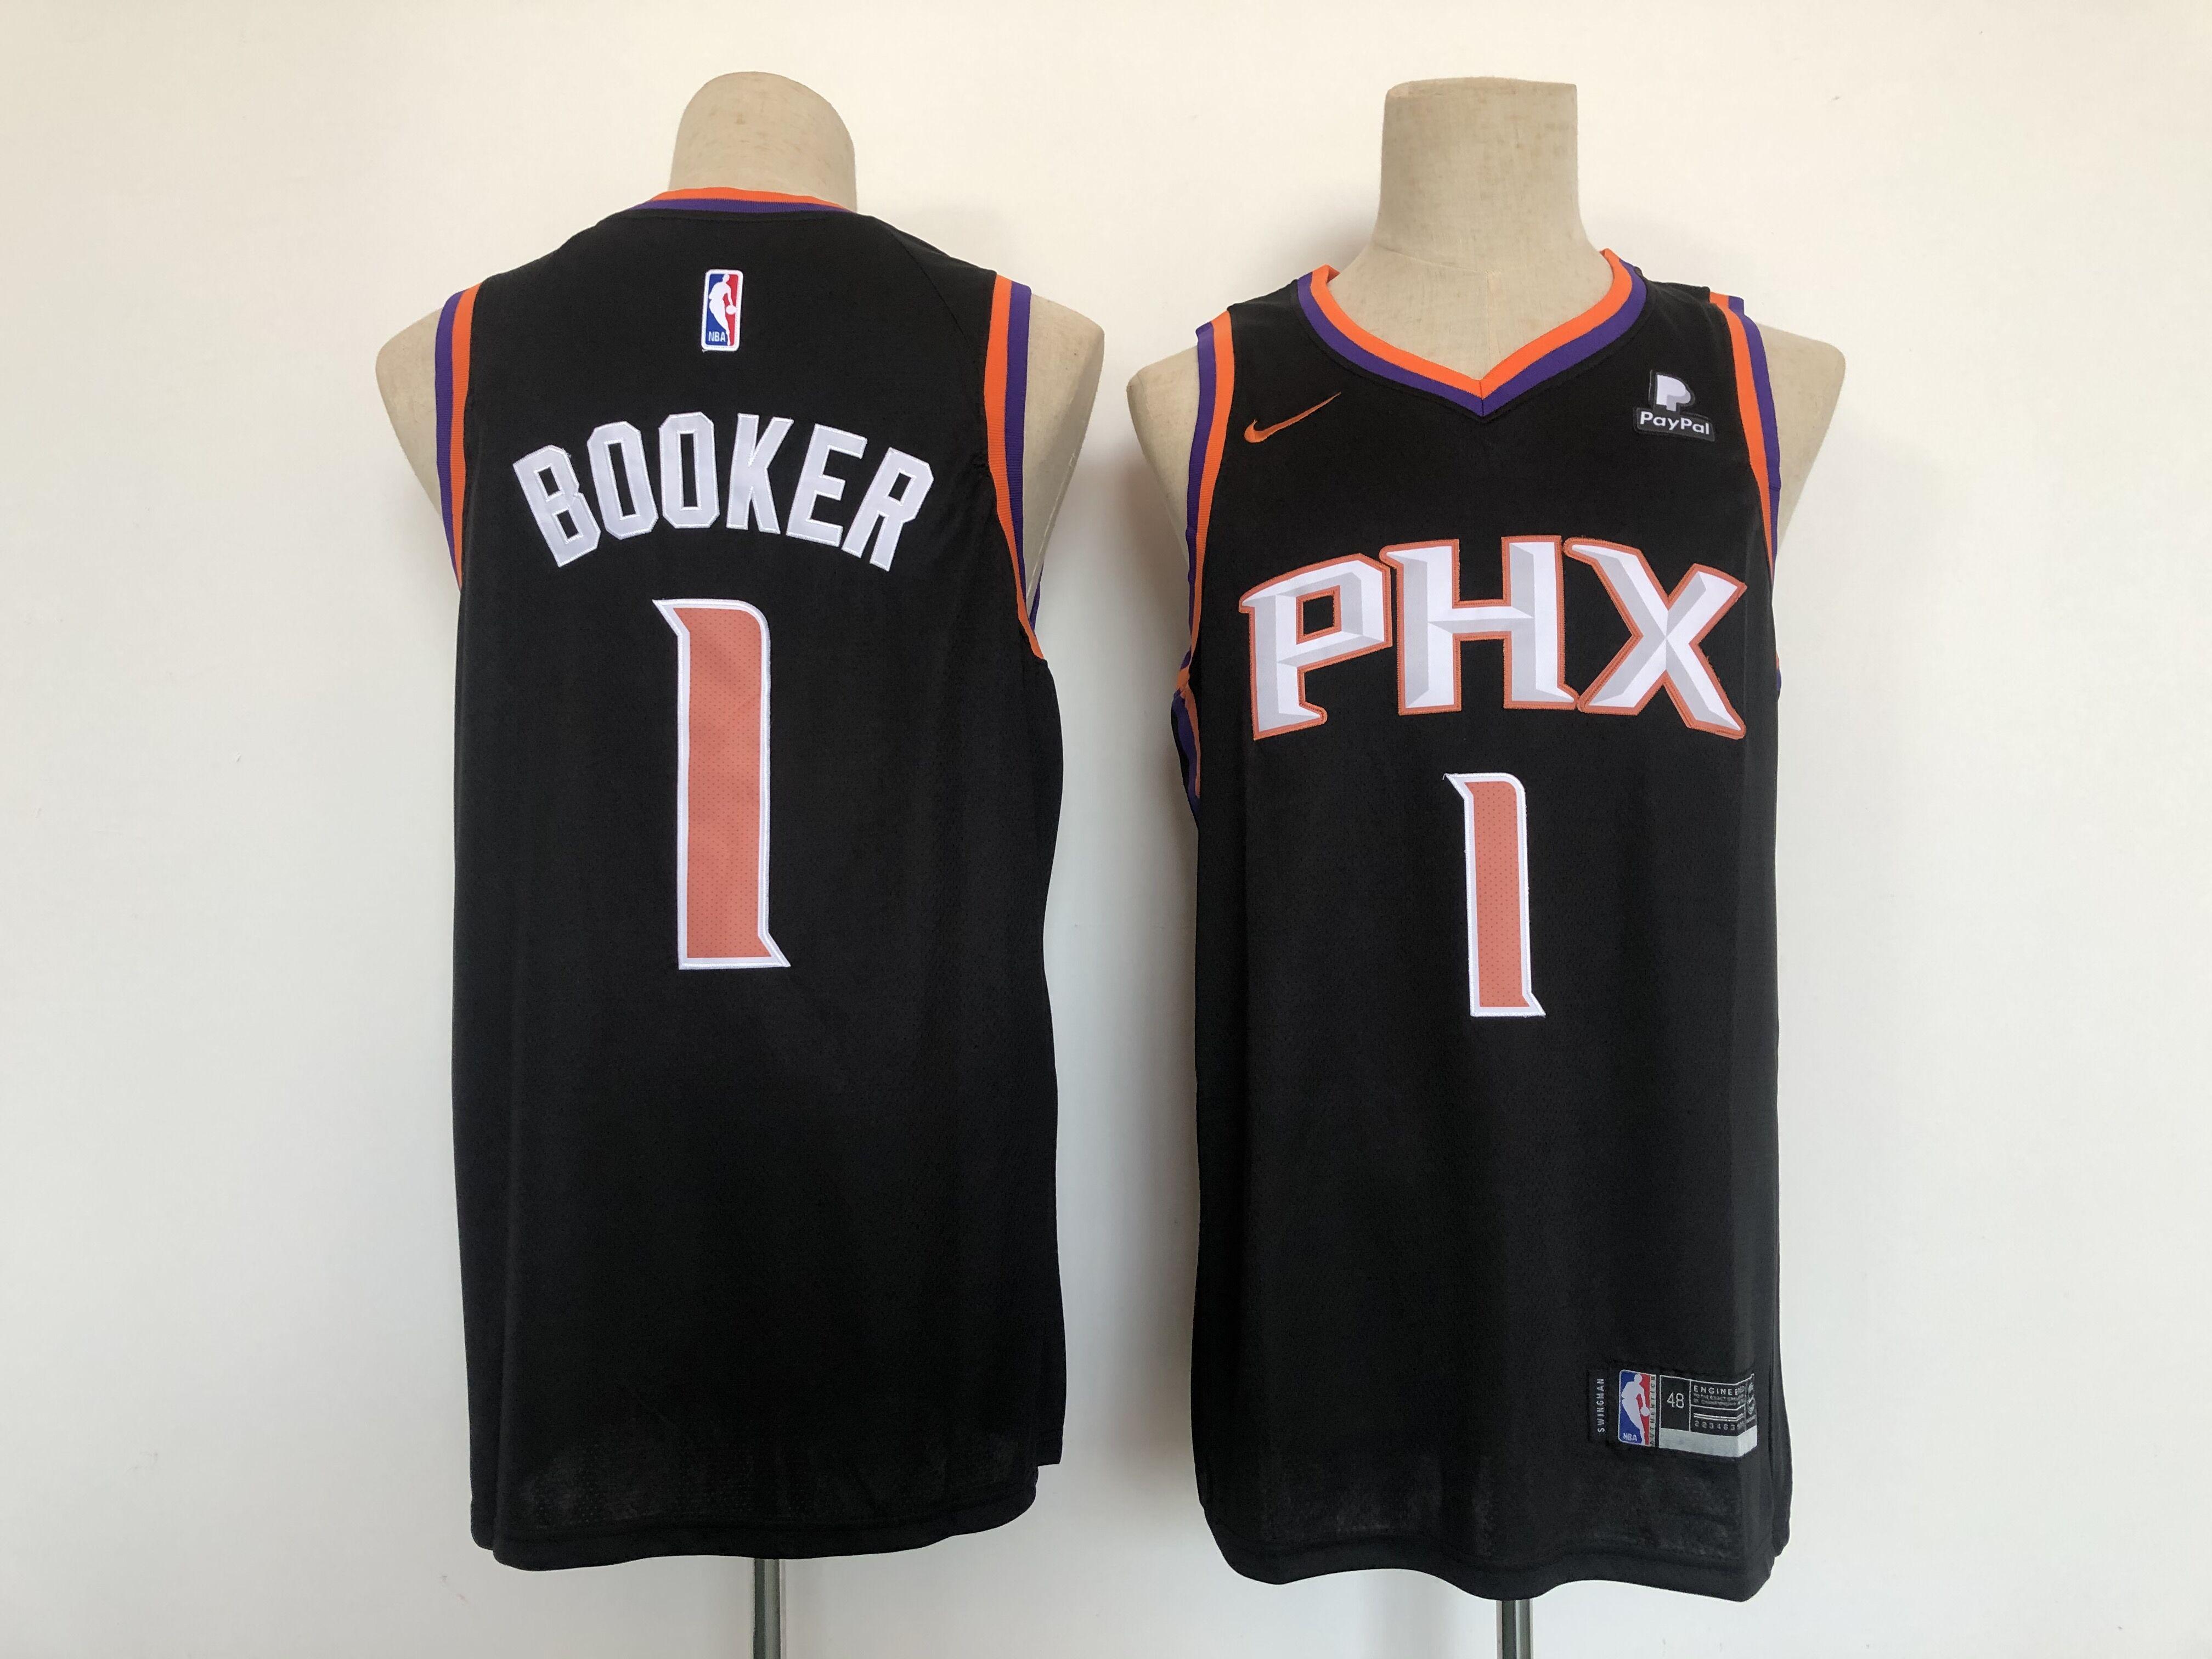 Men Phoenix Suns 1 Booker Black Game Nike 2021 NBA Jersey